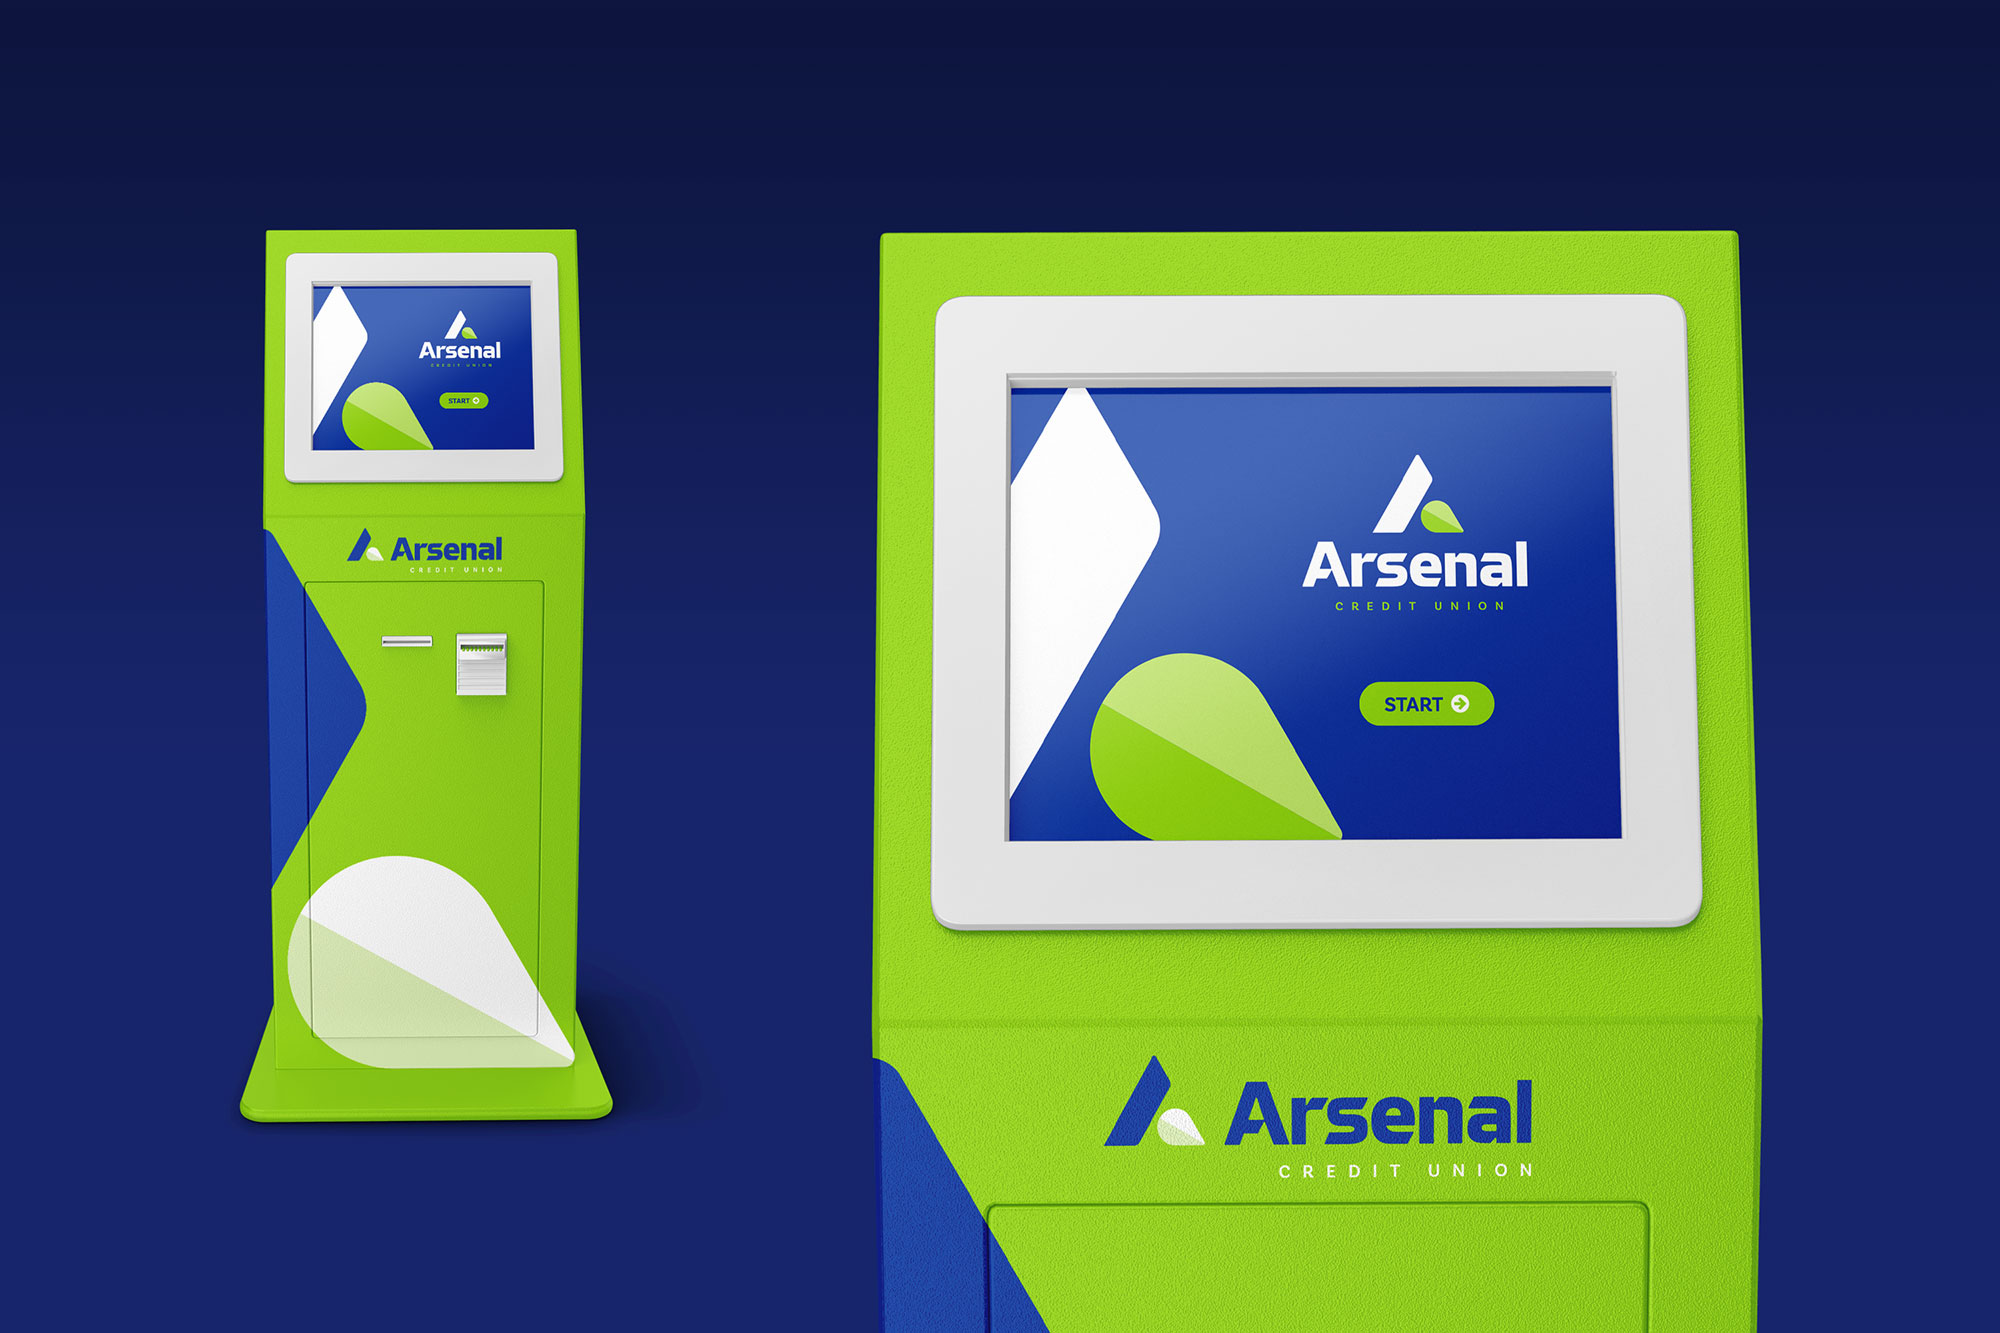 Arsenal-ATM-design